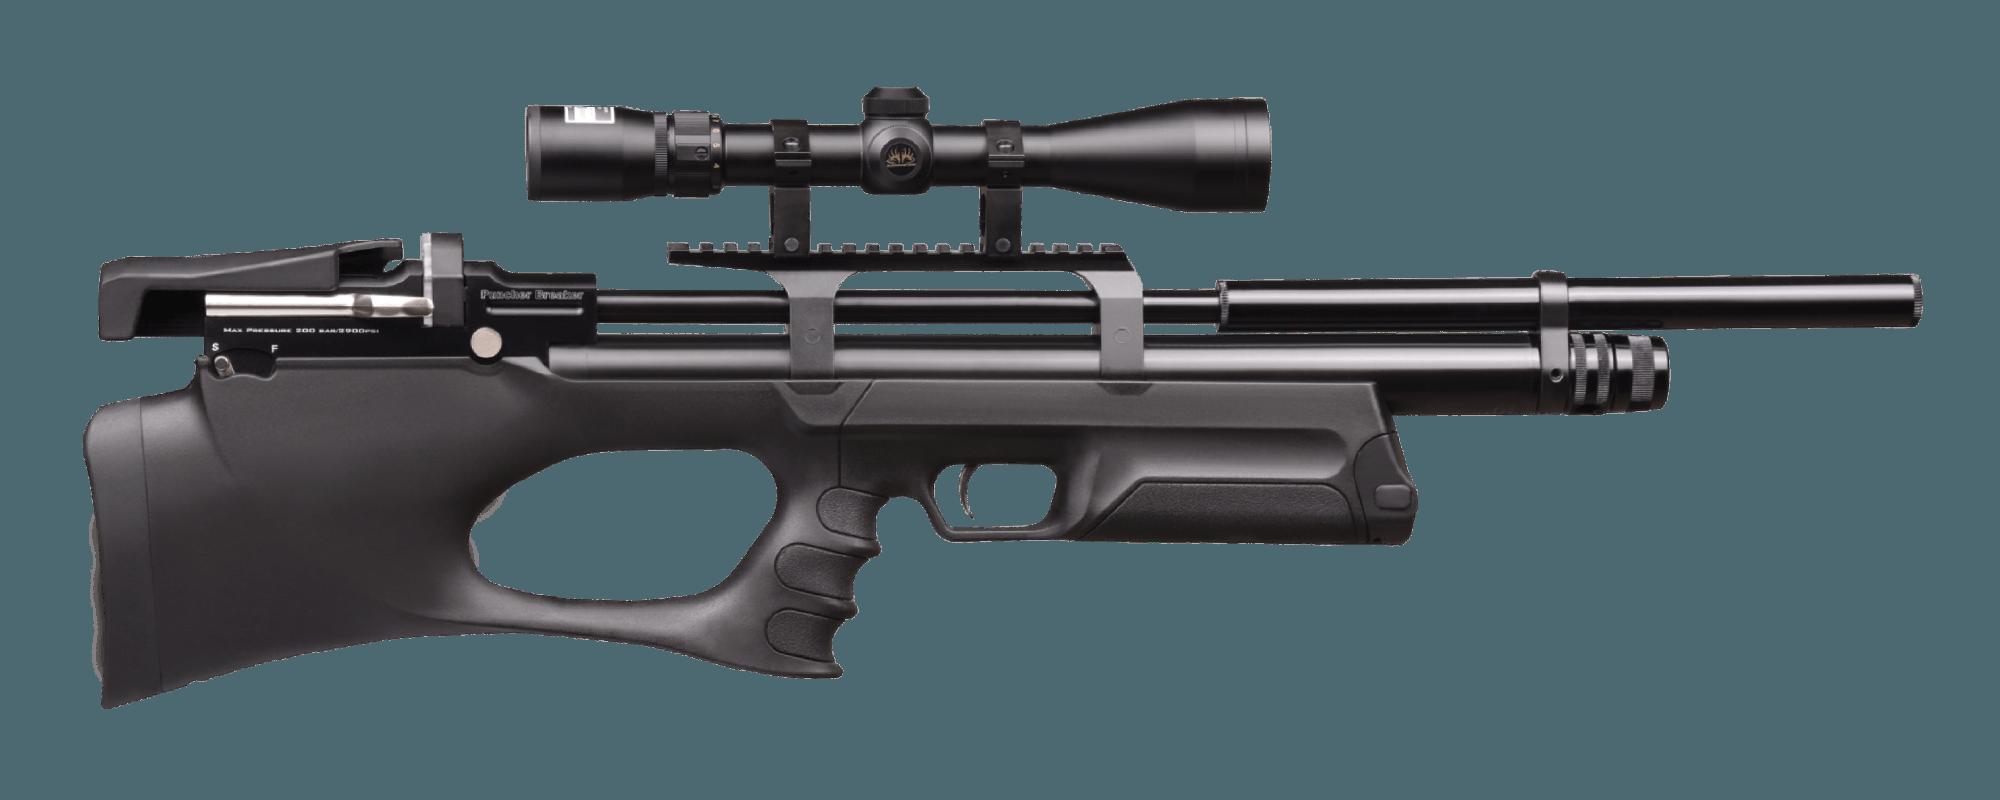 Carabina PCP Kral Puncher Breaker S Silent 5.5mm